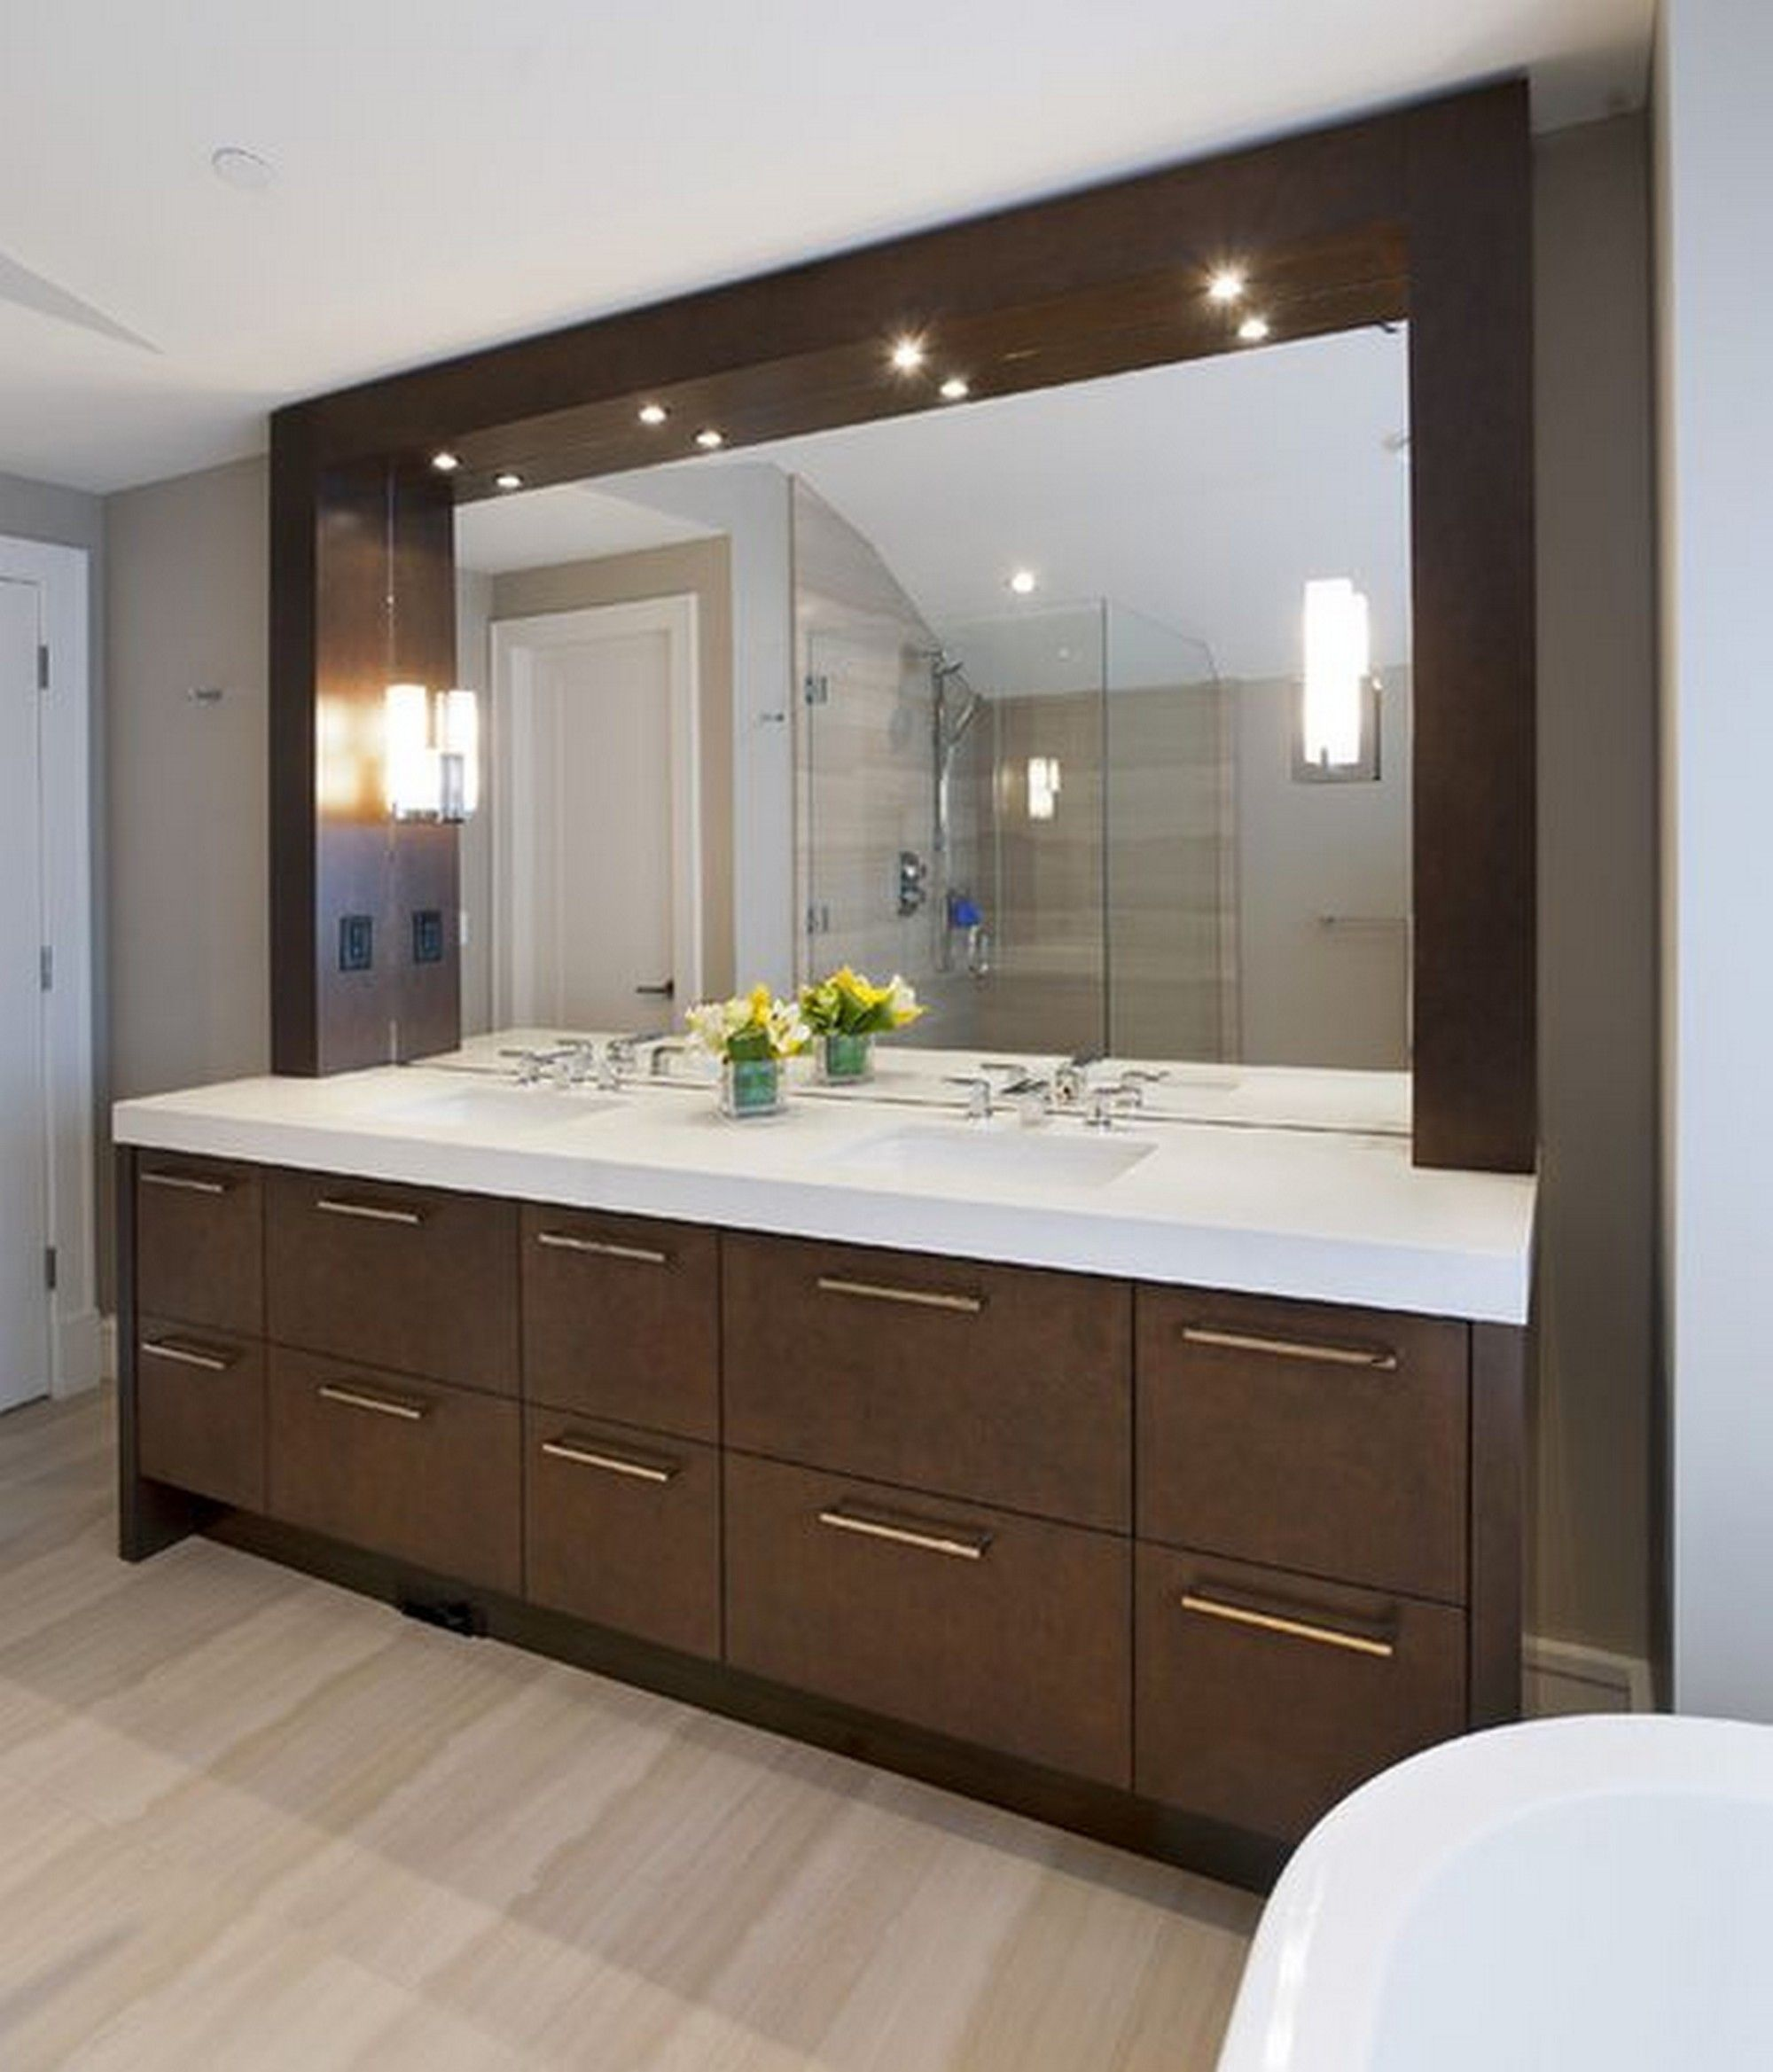 40 Gorgoeus And Modern Bathroom Mirror Ideas Following Are The And Modern Floating Bathroom Vanities Modern Bathroom Mirrors Modern Bathroom Vanity Lighting